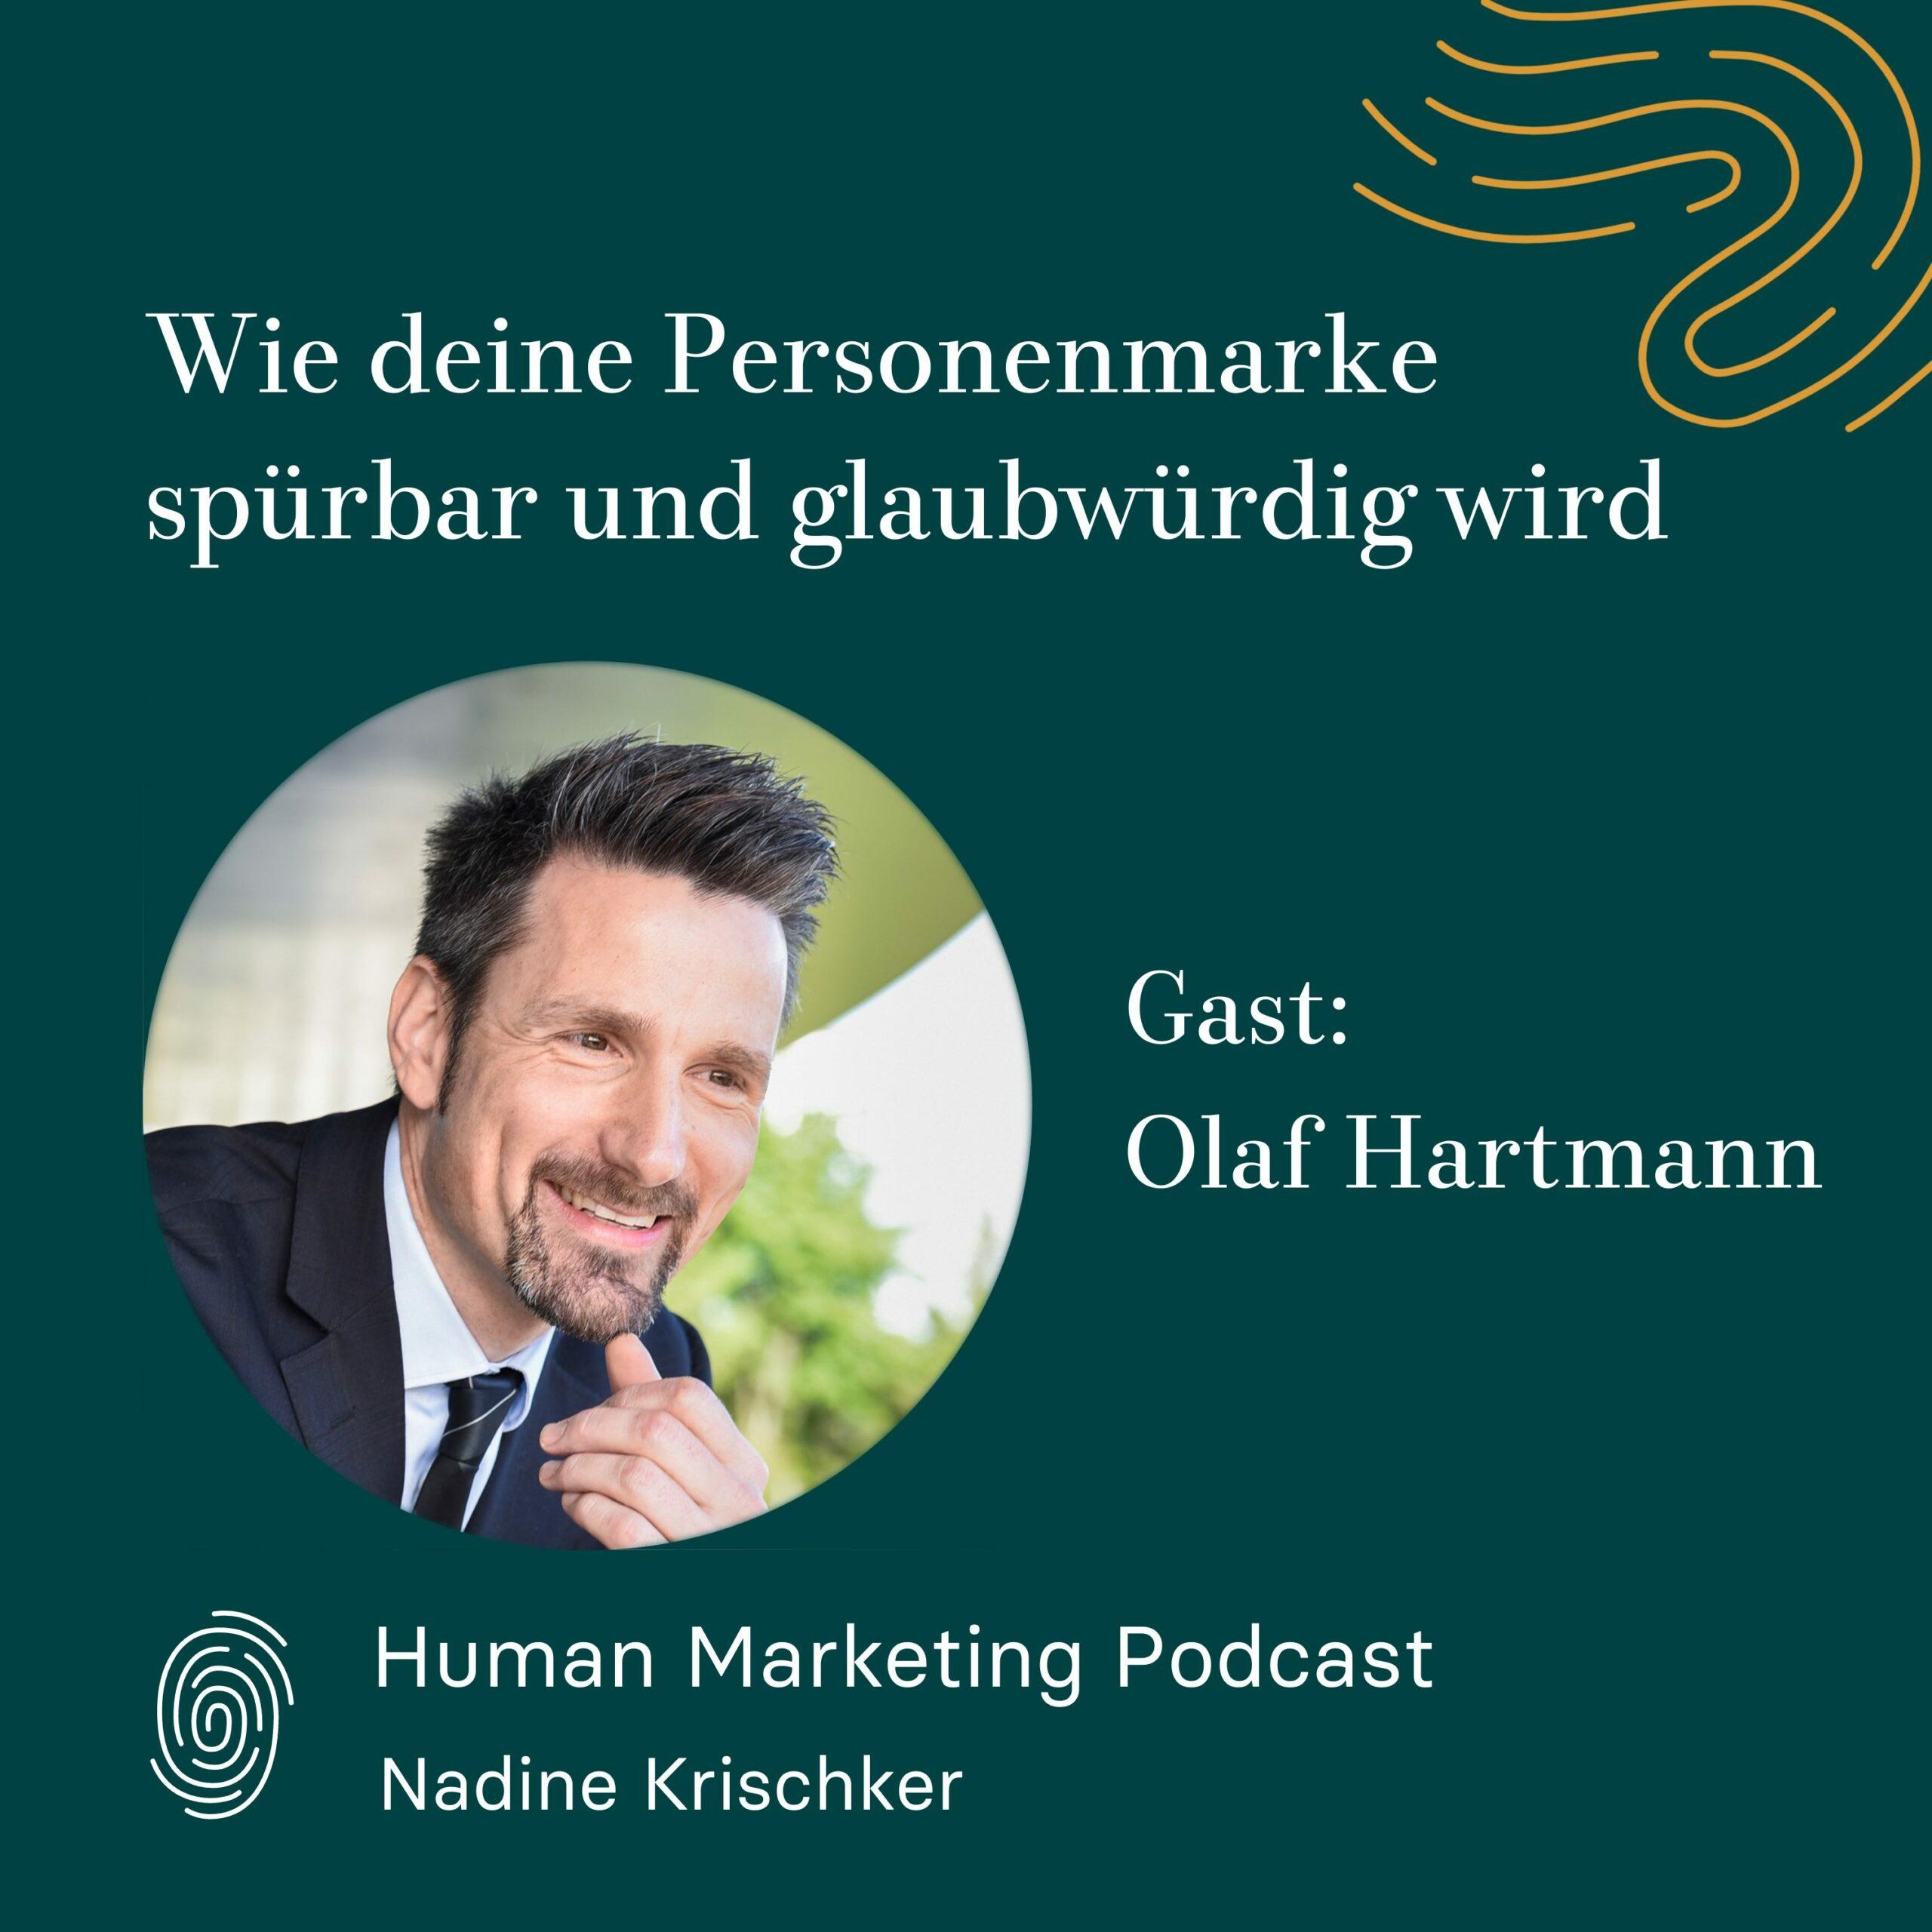 Cover von Olaf Hartmann im Human Marketing Podcast